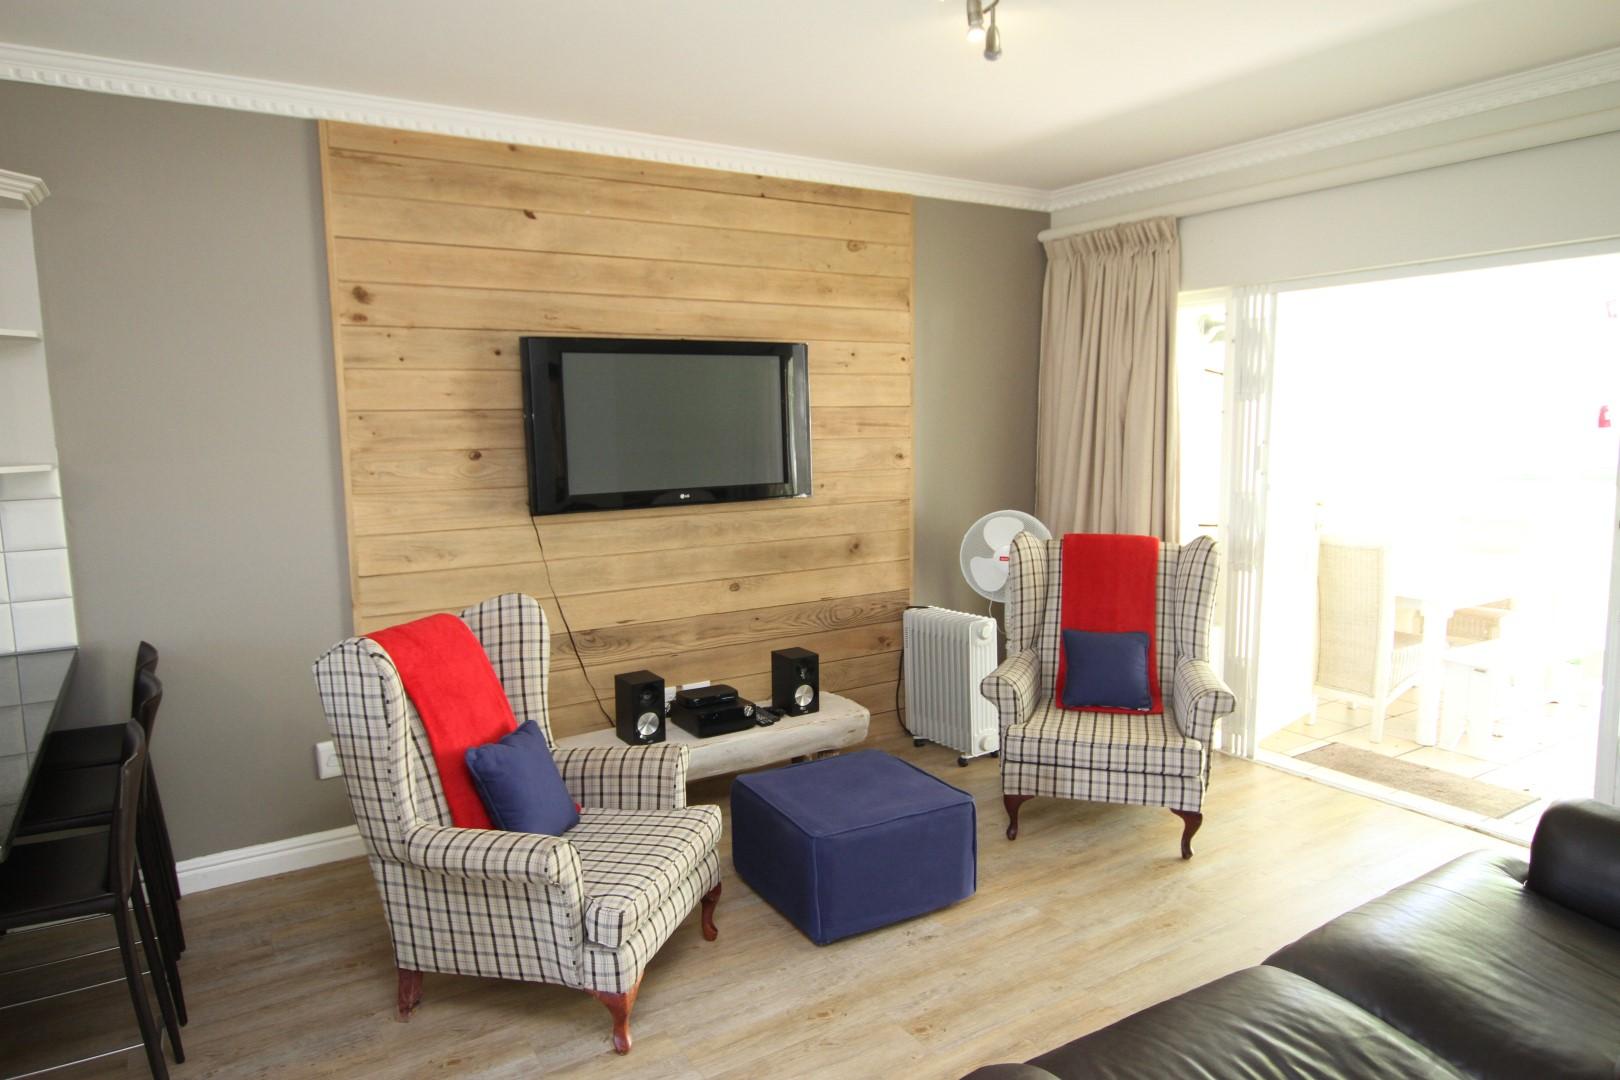 Plettenberg Bay, 6600, 2 Bedrooms Bedrooms, ,2 BathroomsBathrooms,Apartment,For Sale,1080